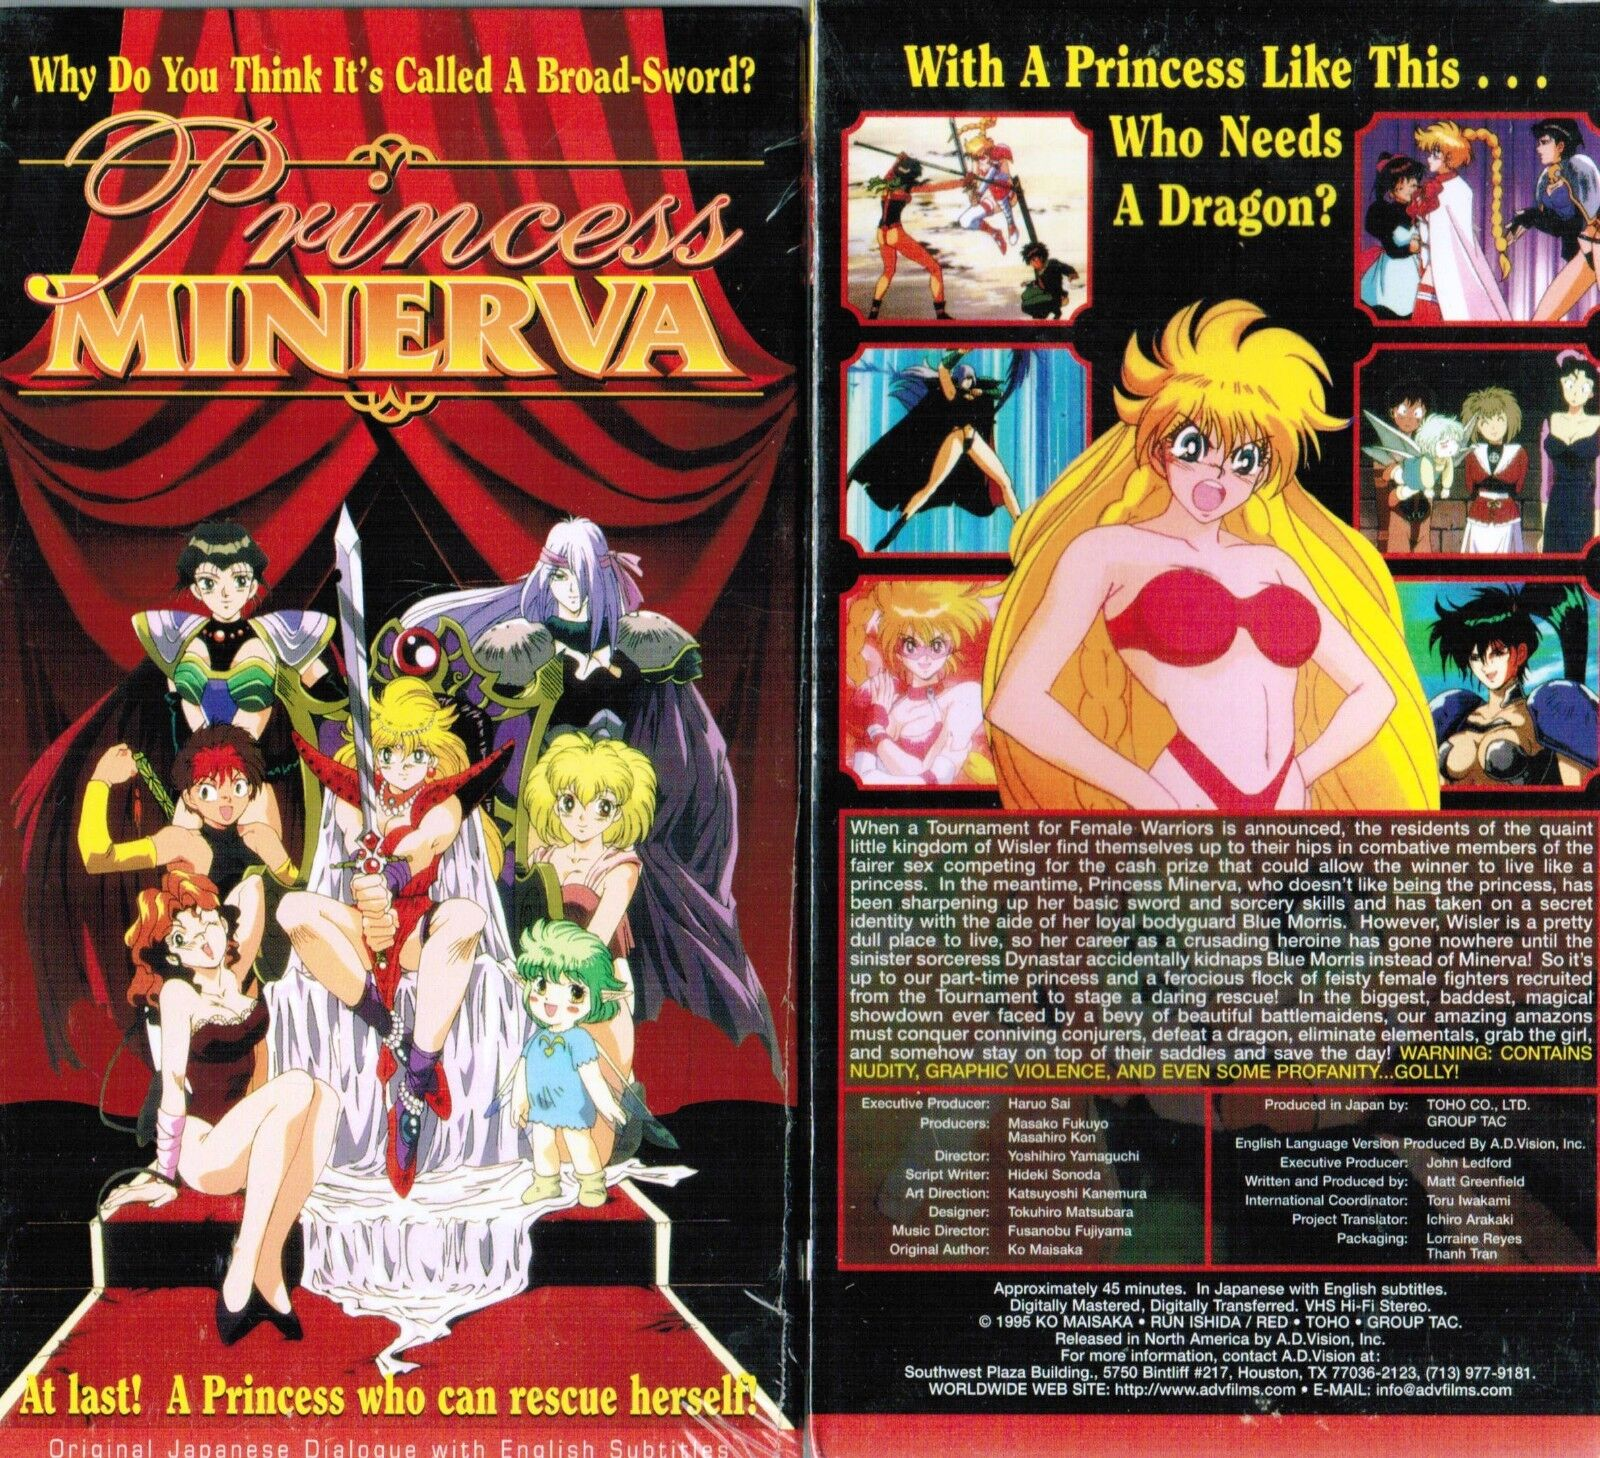 Princess Minerva Anime VHS Video Tape New English Subbed